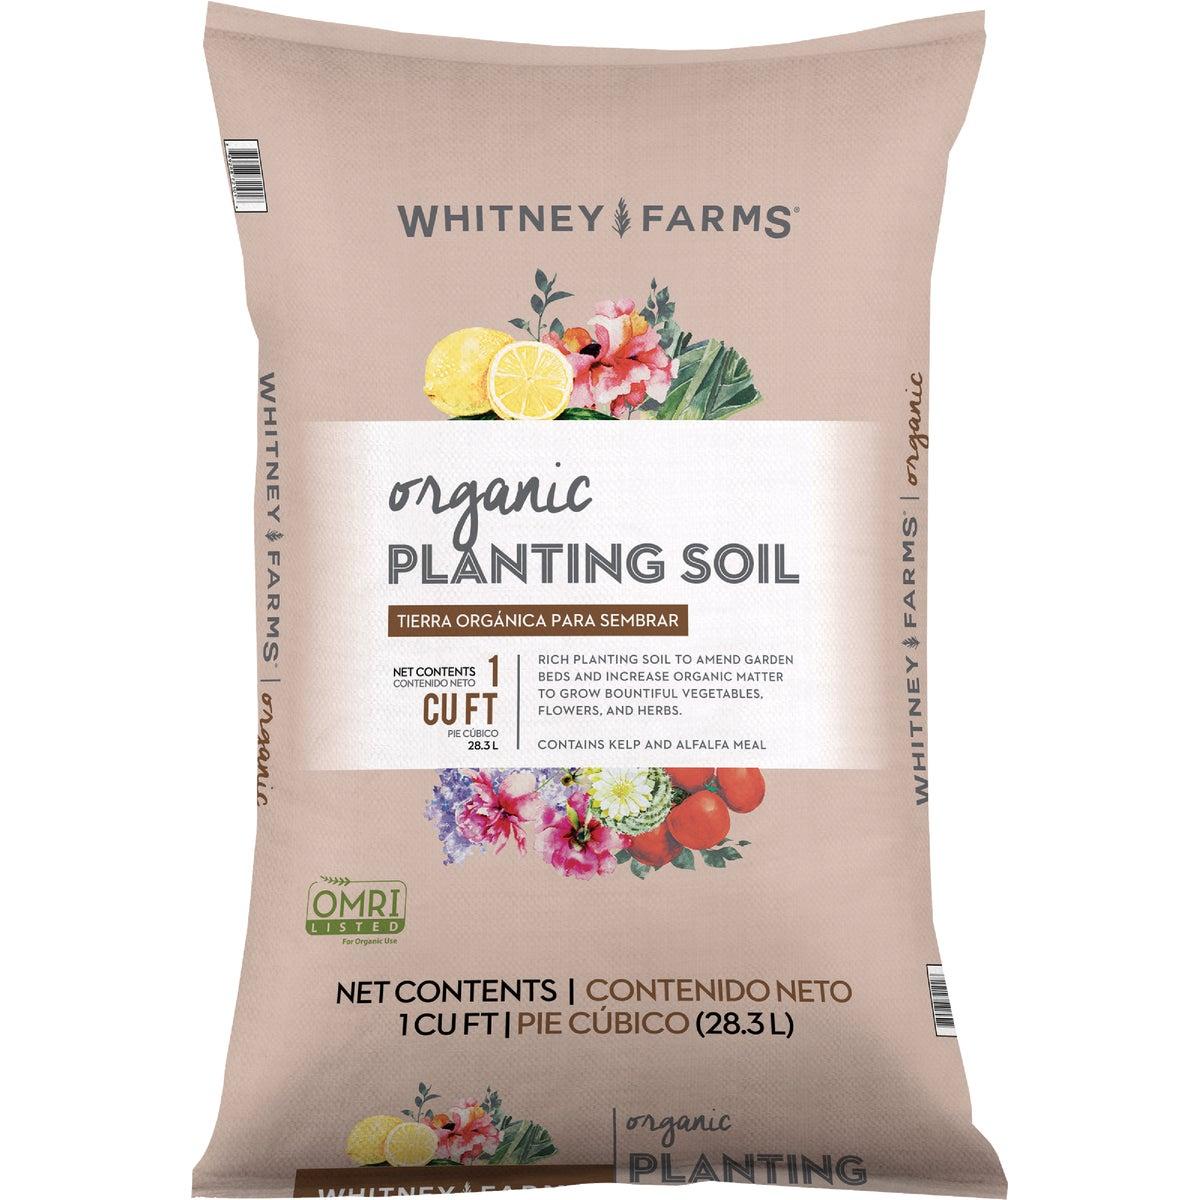 Scotts Organics 1CF WF ORGANC PLANT SOIL 72151240